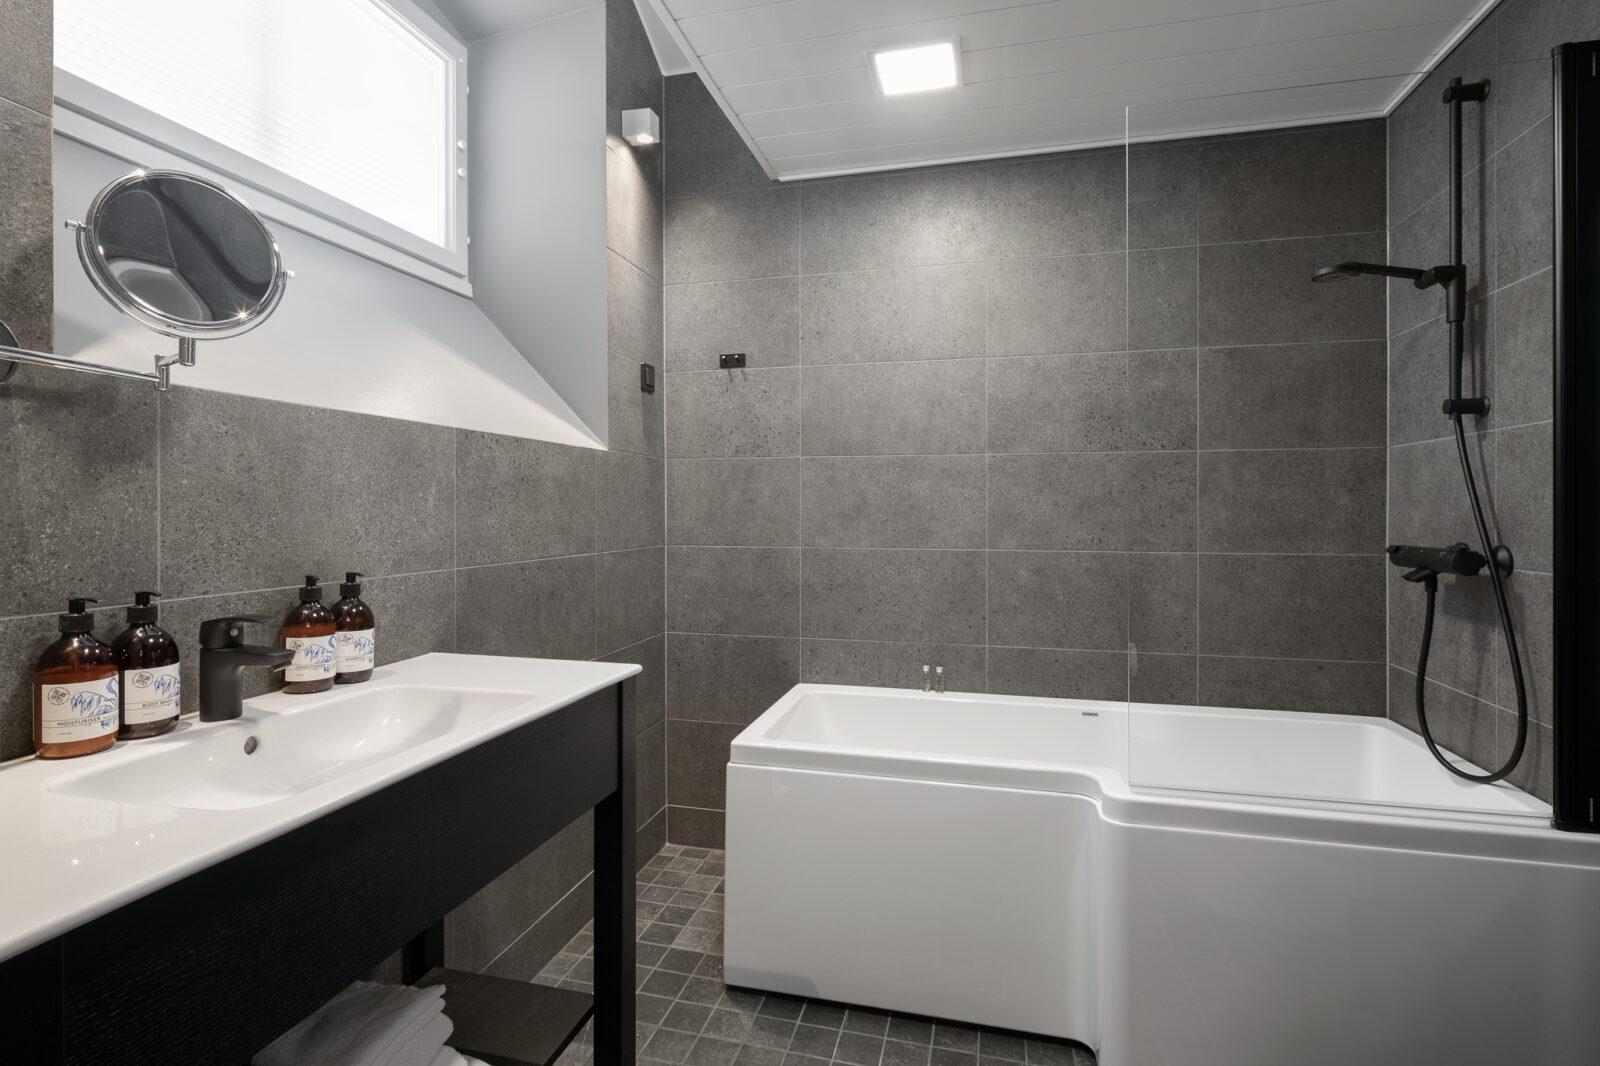 Standard-huone kylpyhuone